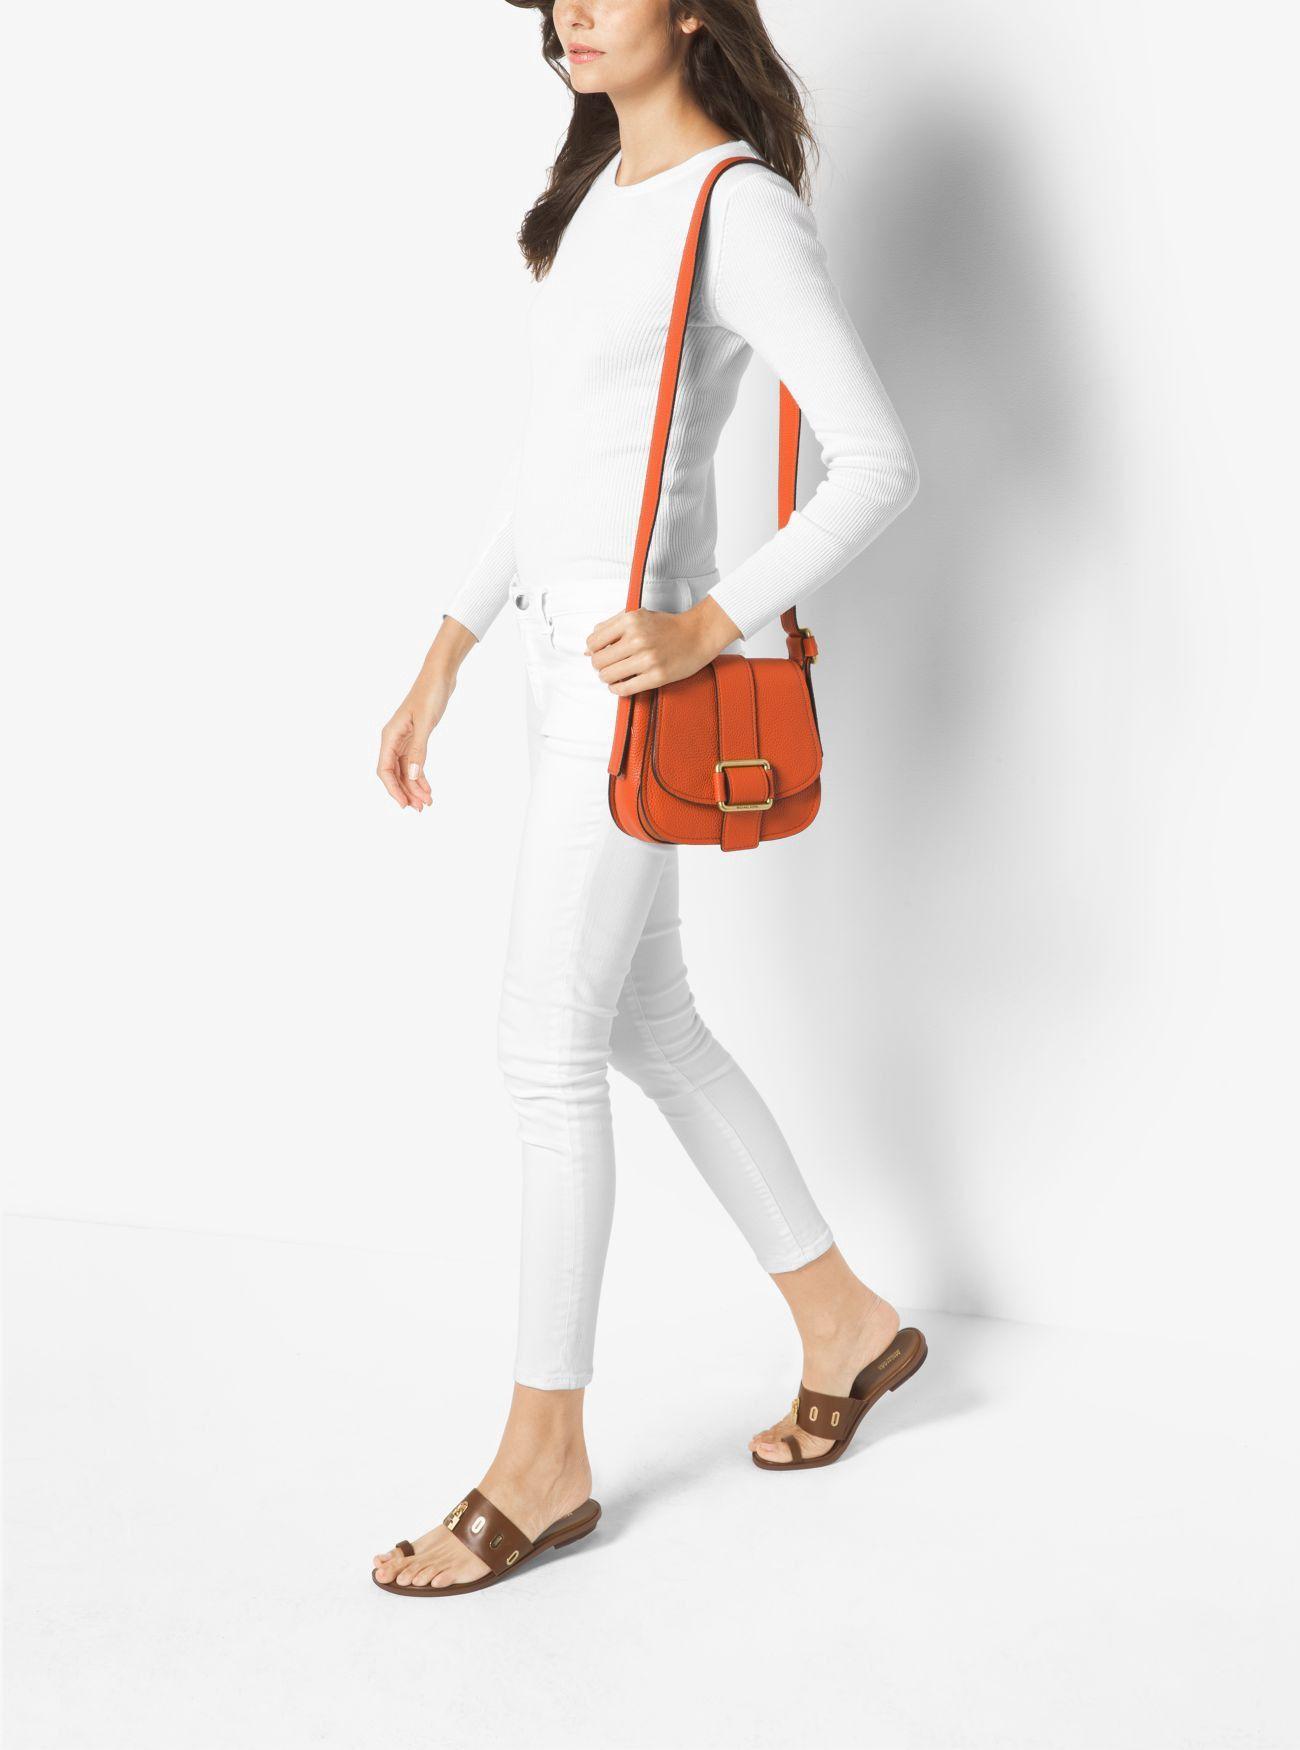 fbb1681c7ae79 MICHAEL KORS Maxine Medium Leather Saddlebag.  michaelkors  bags  leather   lining  travel bags  weekend  polyester